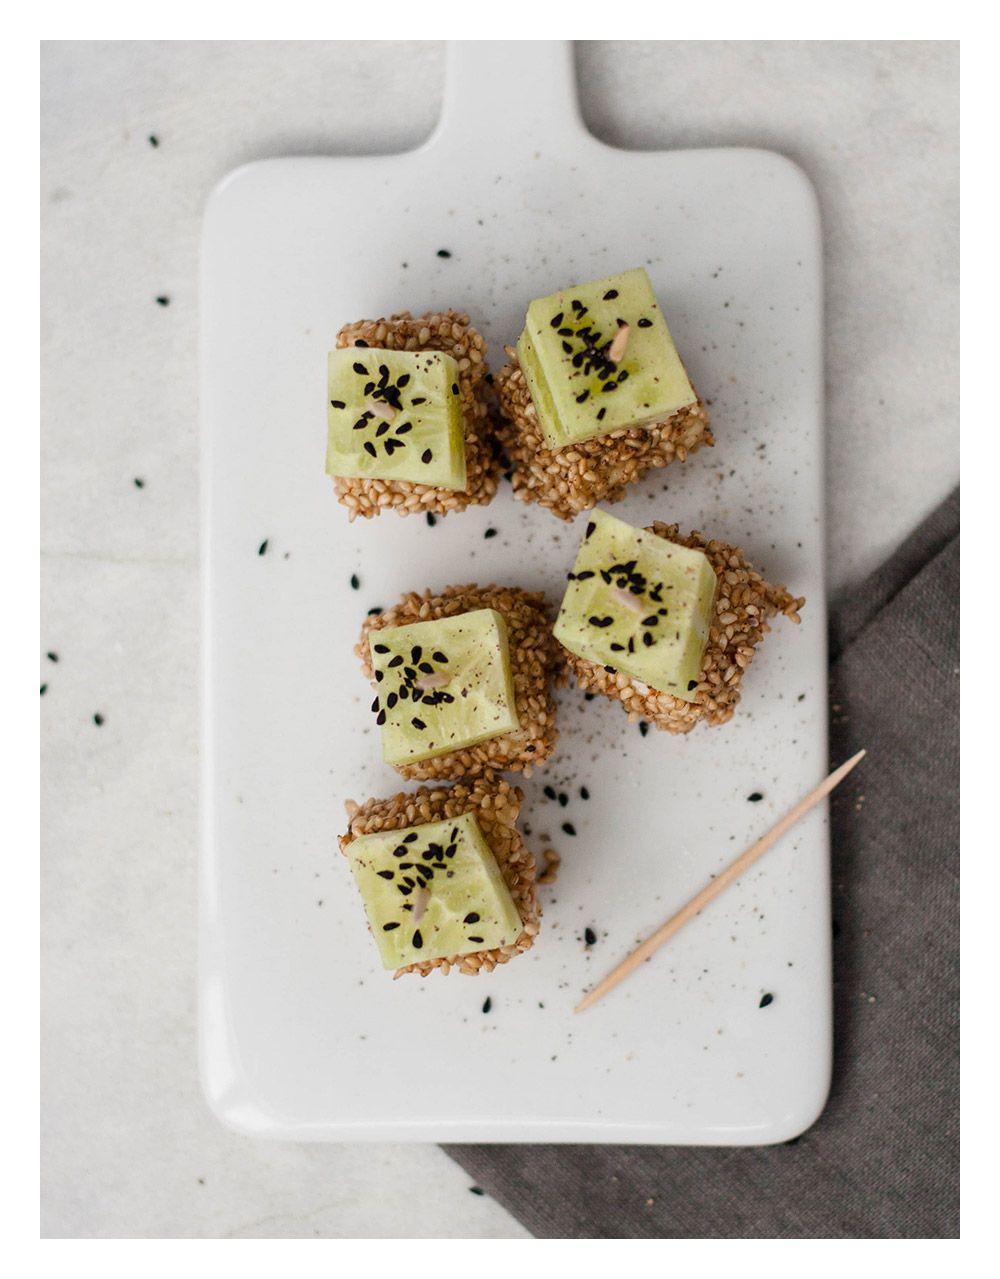 Sesam-Gurken-Appetizer | TheVeggieKitchn Blog